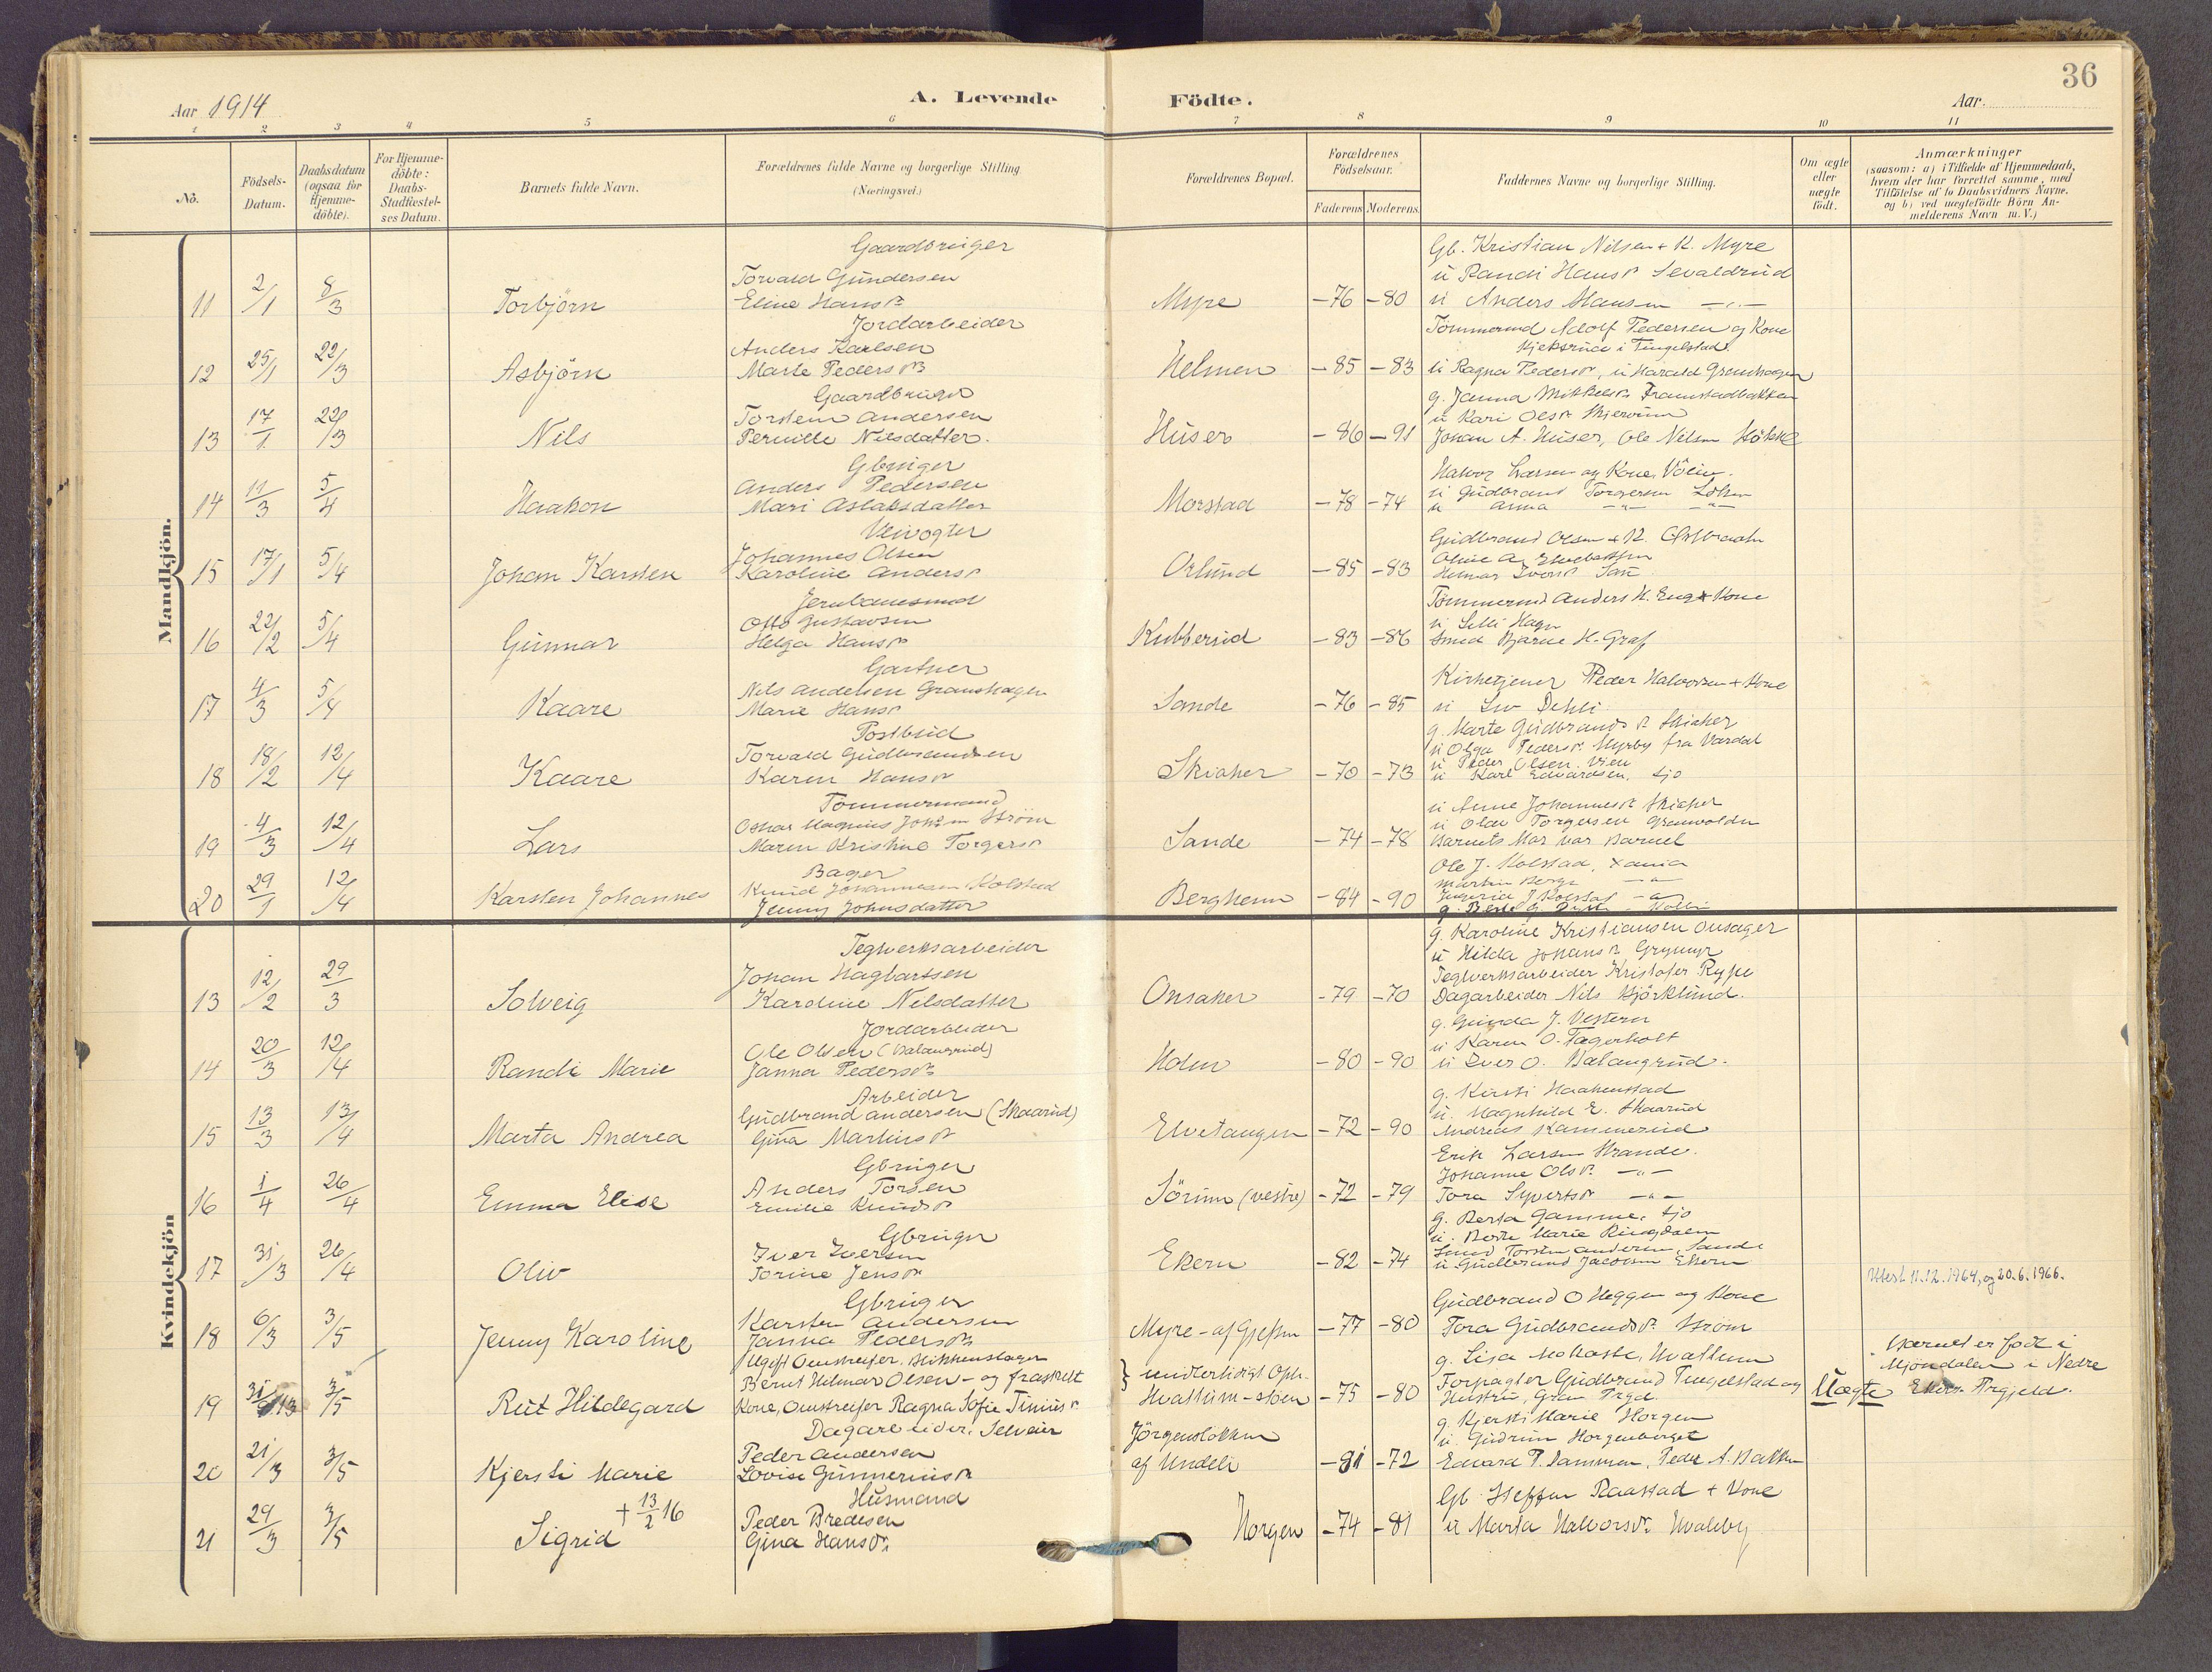 SAH, Gran prestekontor, Ministerialbok nr. 21, 1908-1932, s. 36